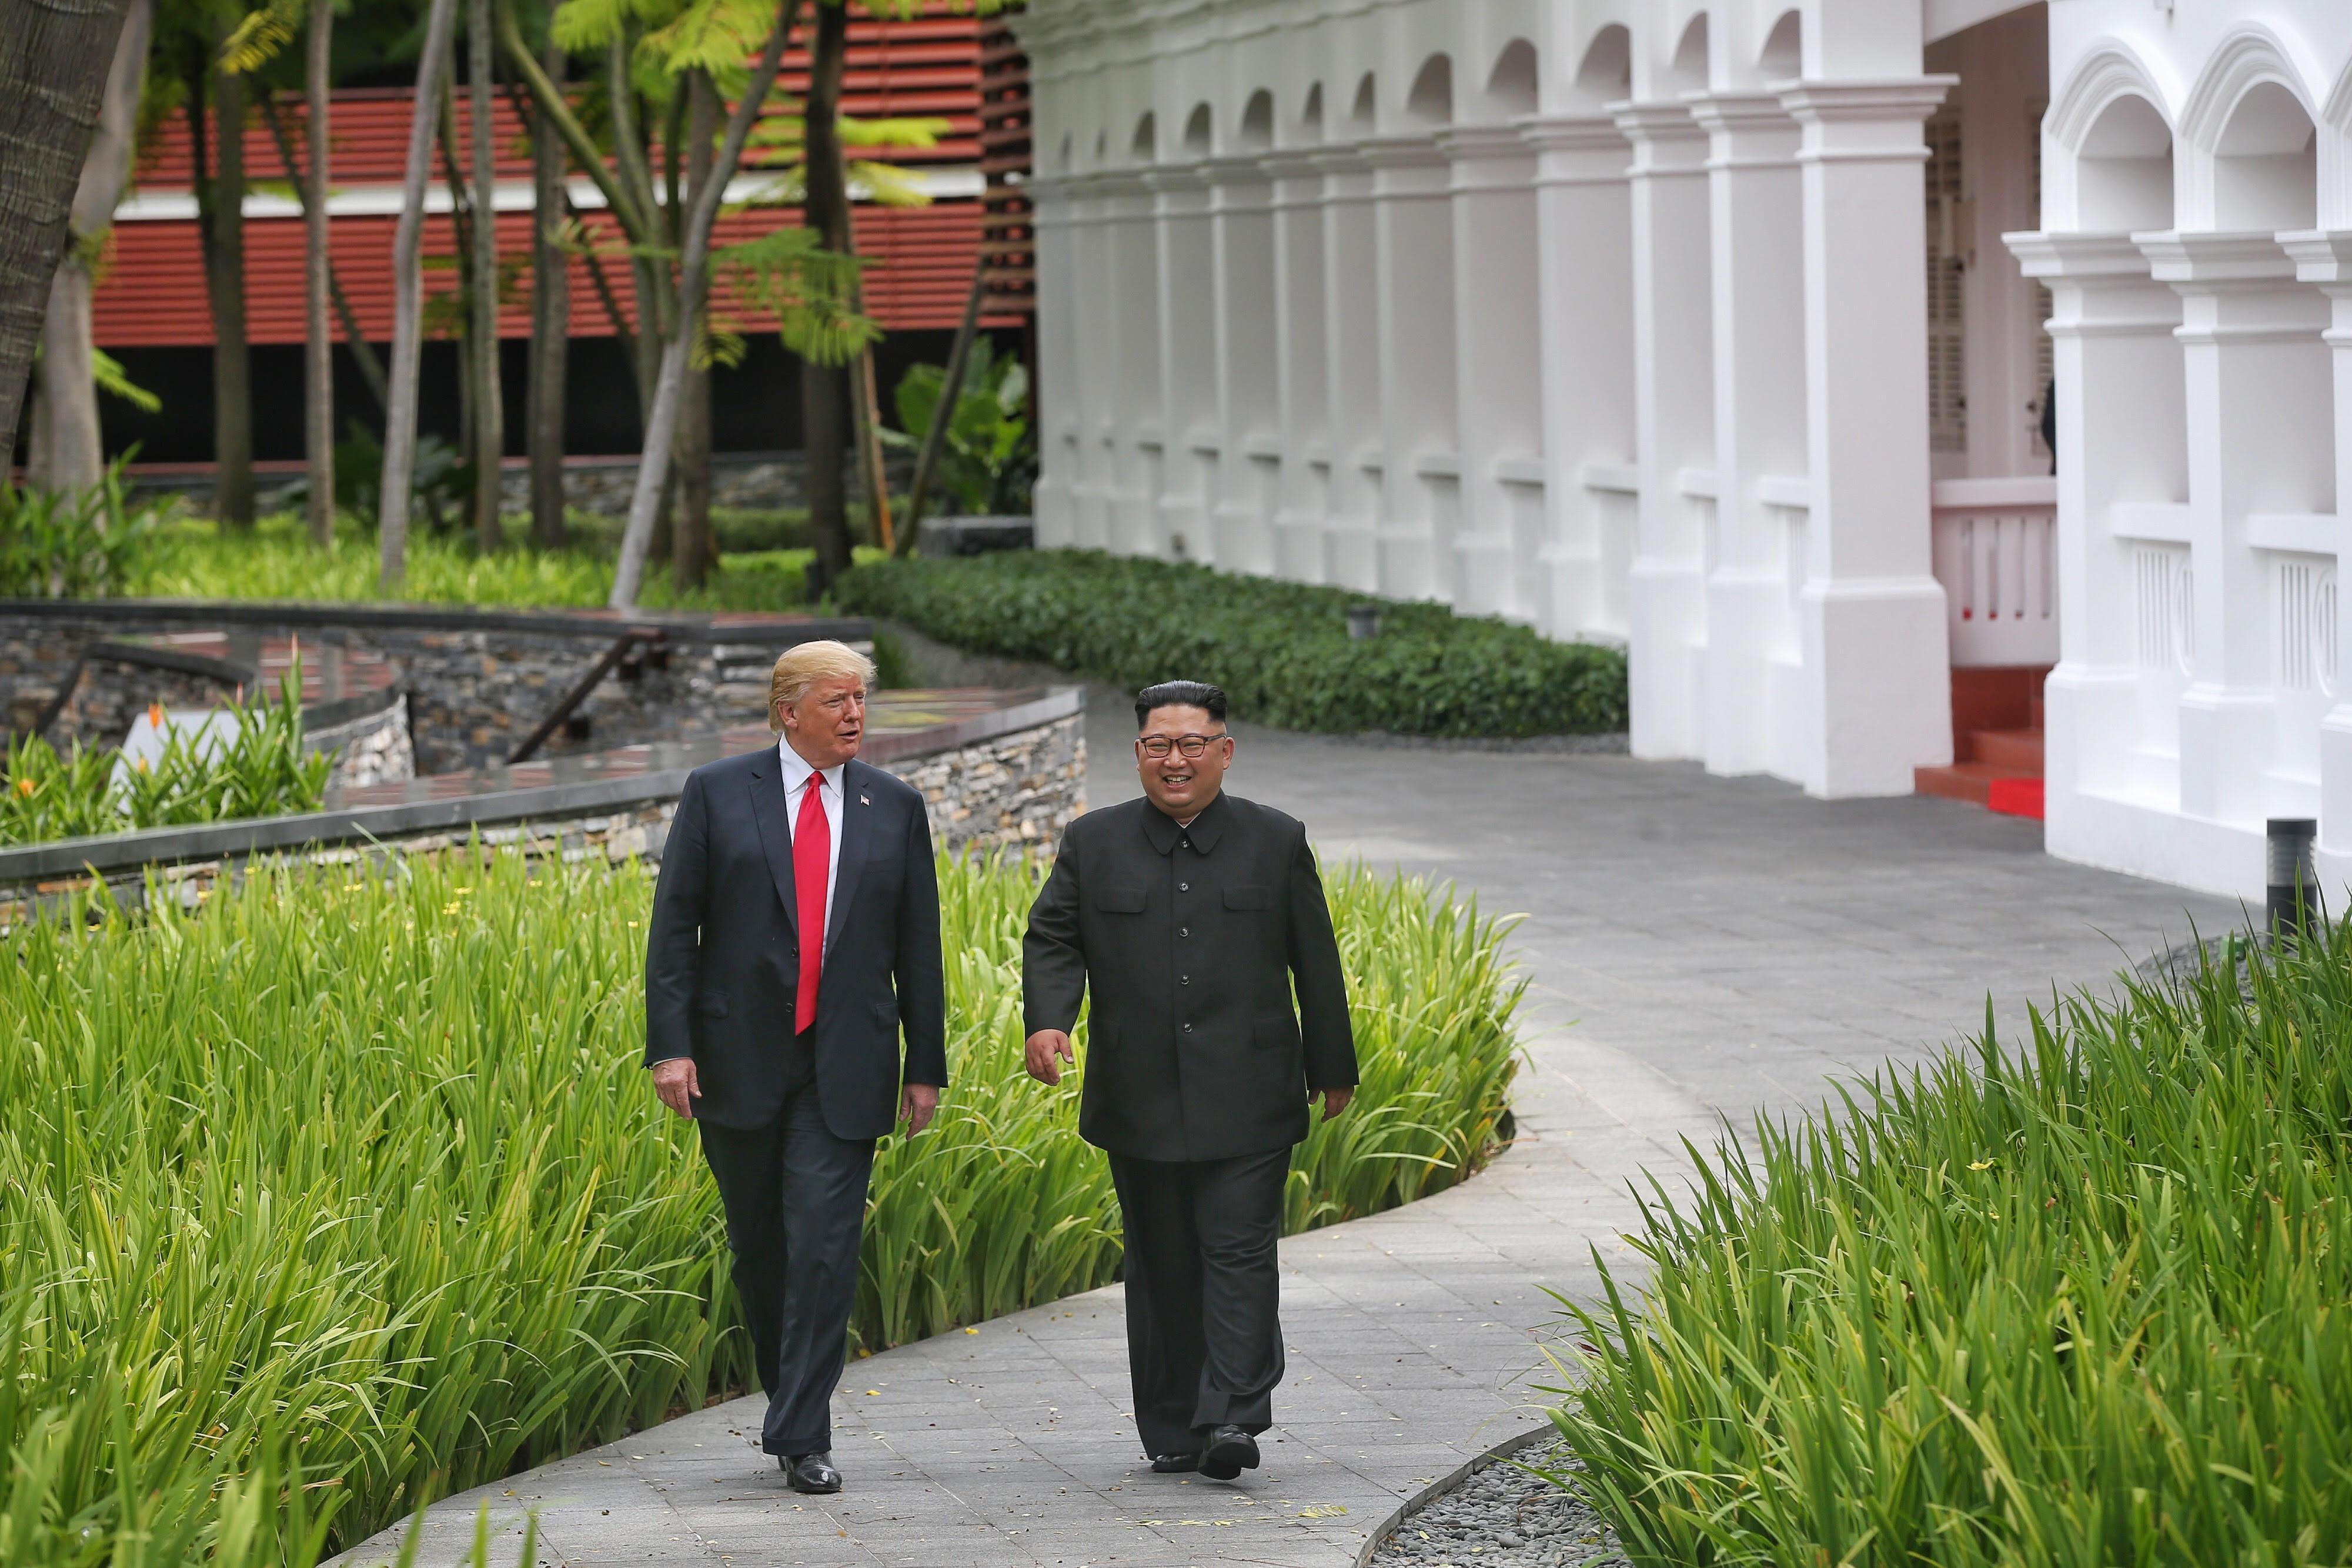 Photo courtesy: Kevin Lim, Straits Times